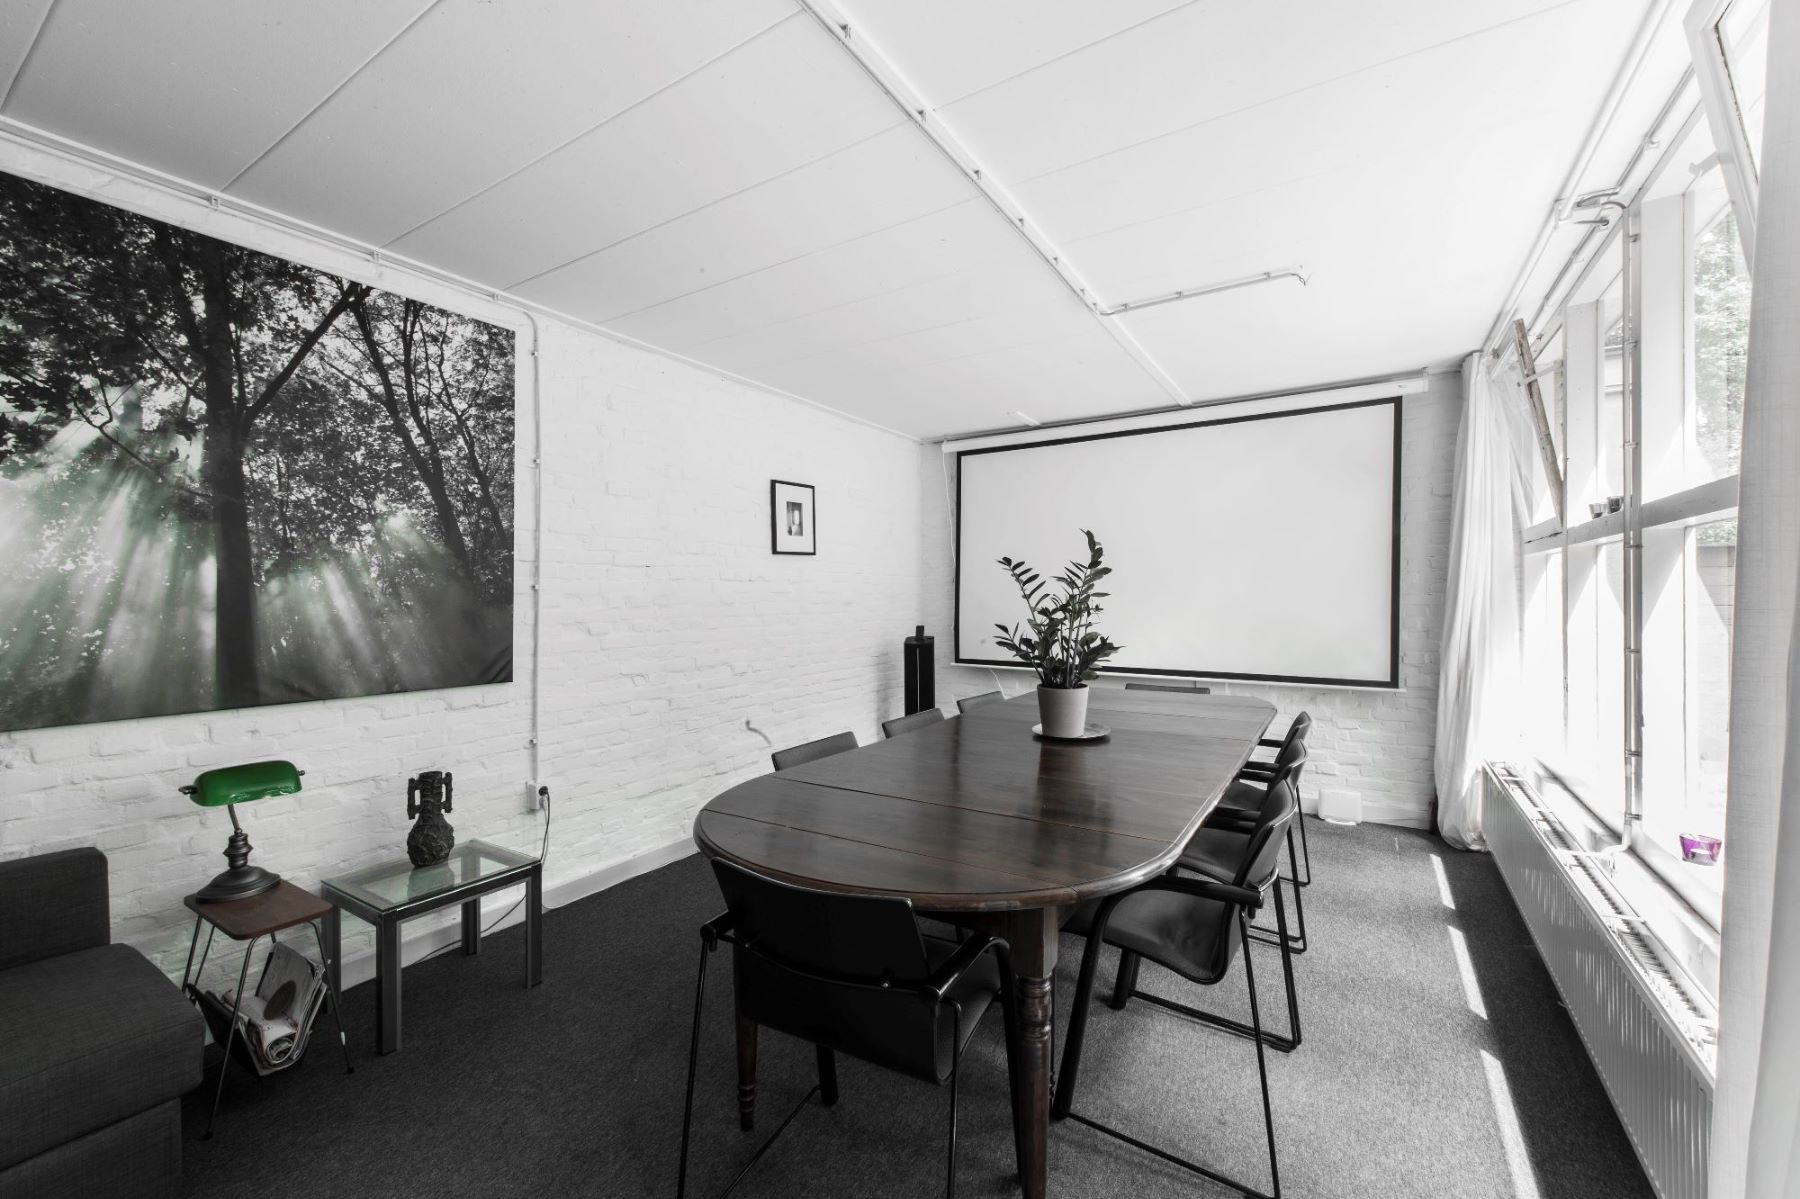 Kantoorgebouw Amsterdam Herengracht vergaderruimte overzicht